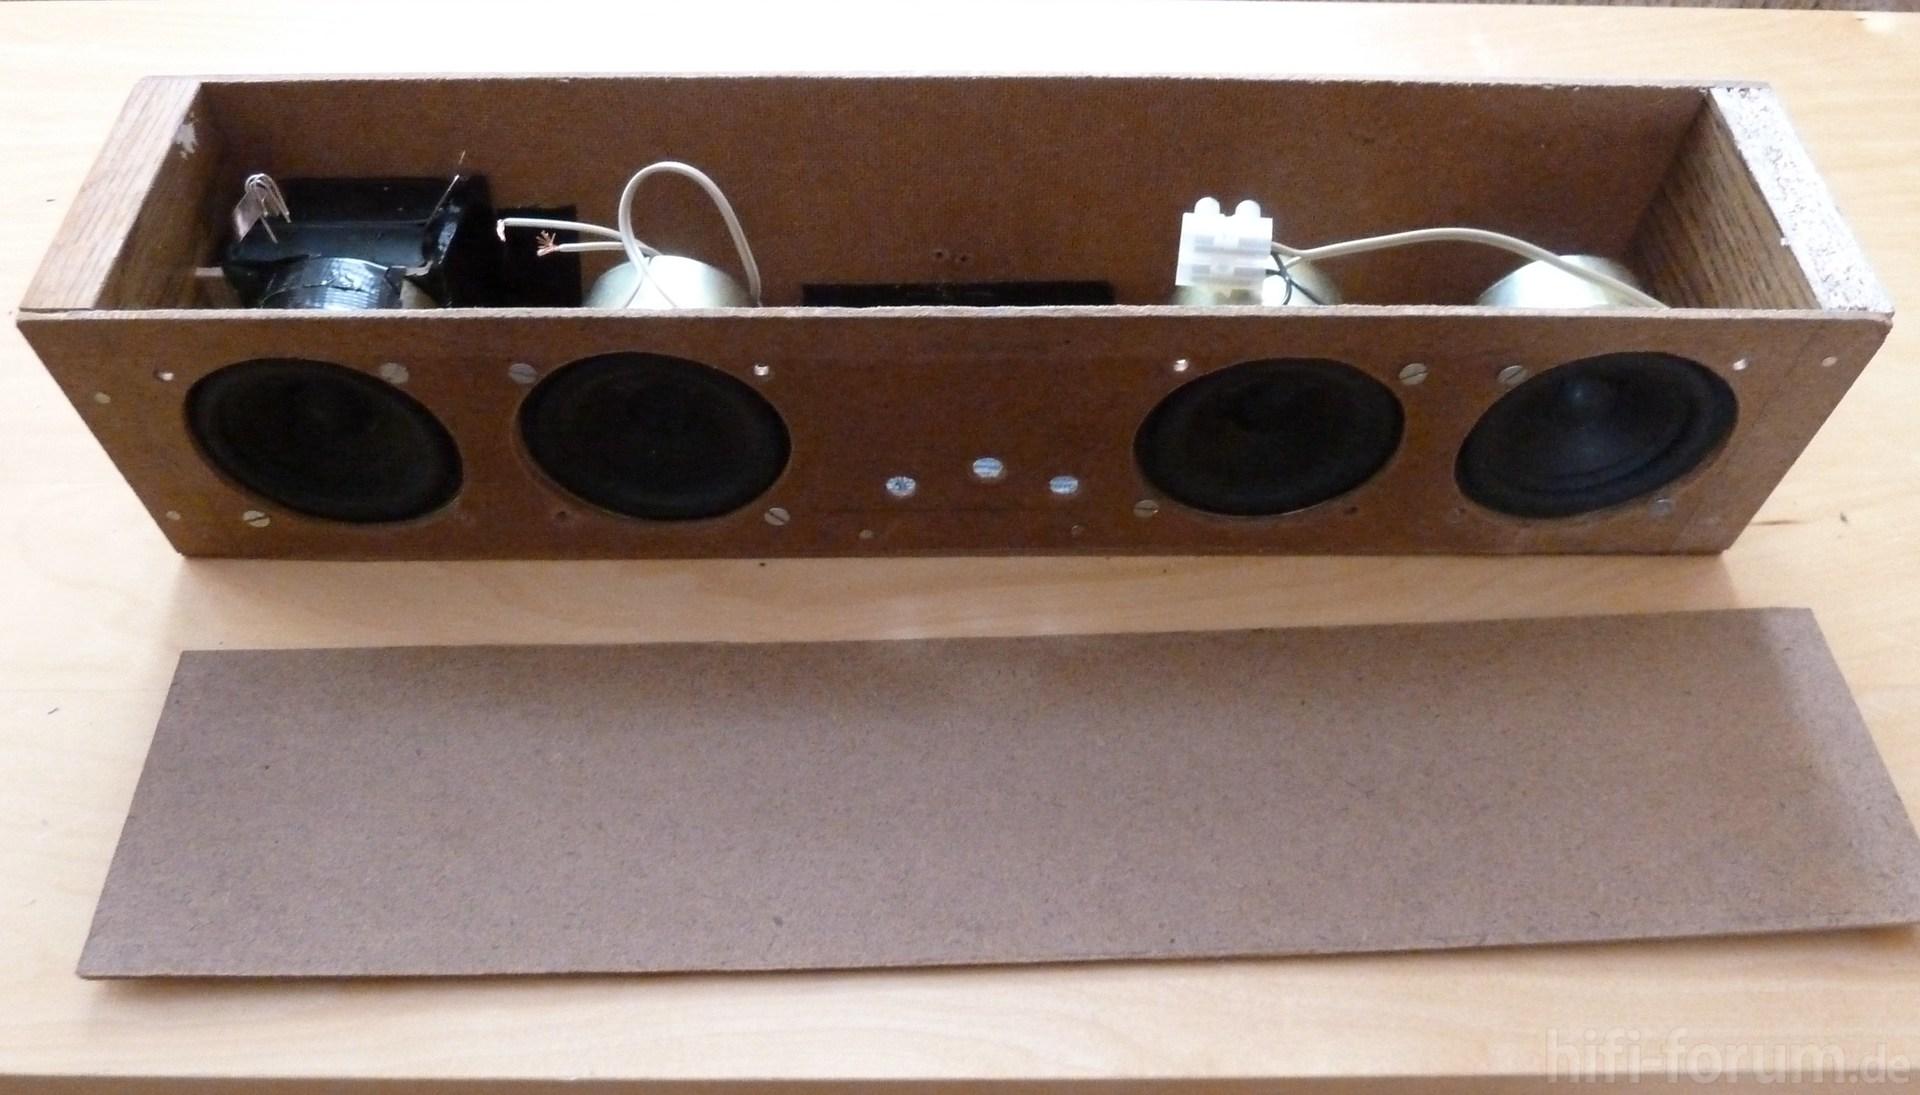 hilfe bei chassis auswahl f r tragbaren lautsprecher. Black Bedroom Furniture Sets. Home Design Ideas